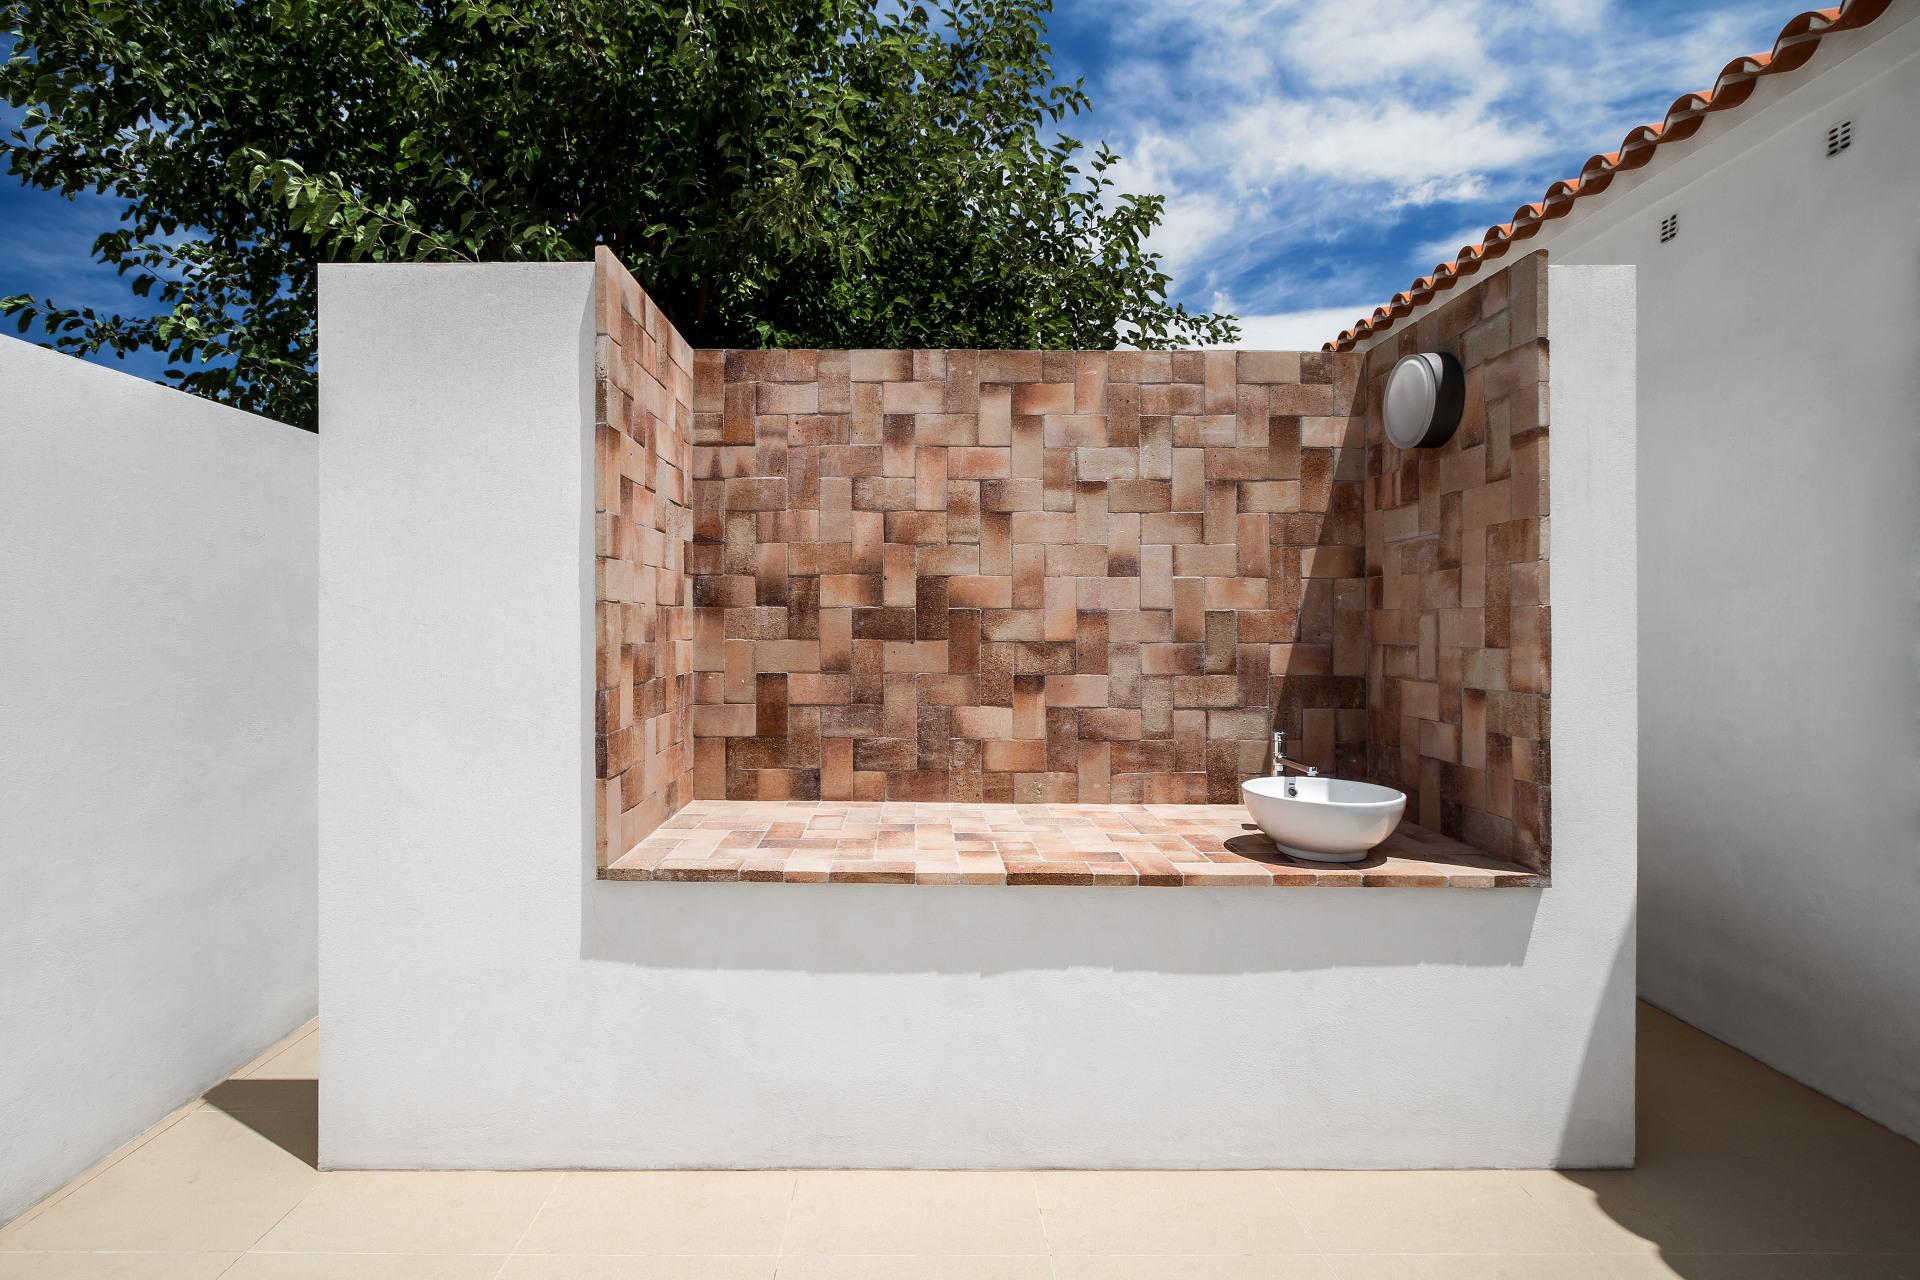 fotografia-arquitectura-valencia-german-cabo-selecta-home-denia (11)